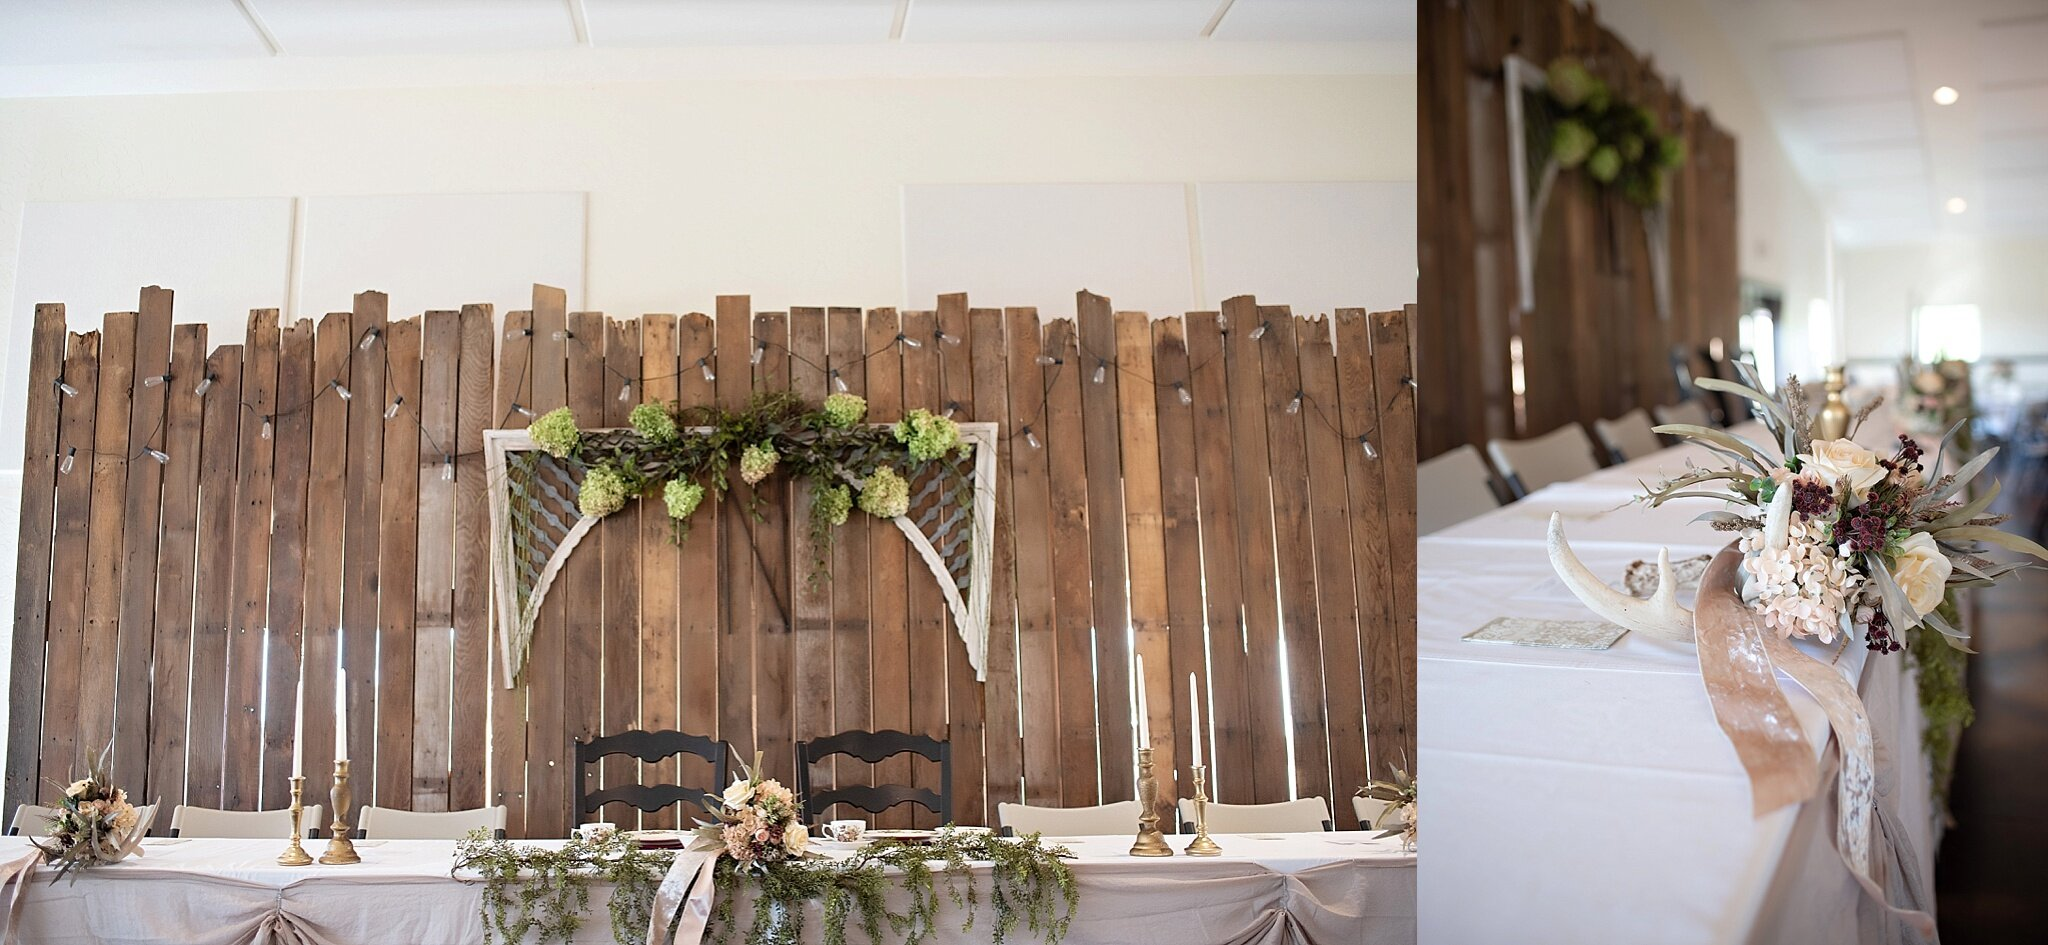 green hydrangeas and hunting theme wedding